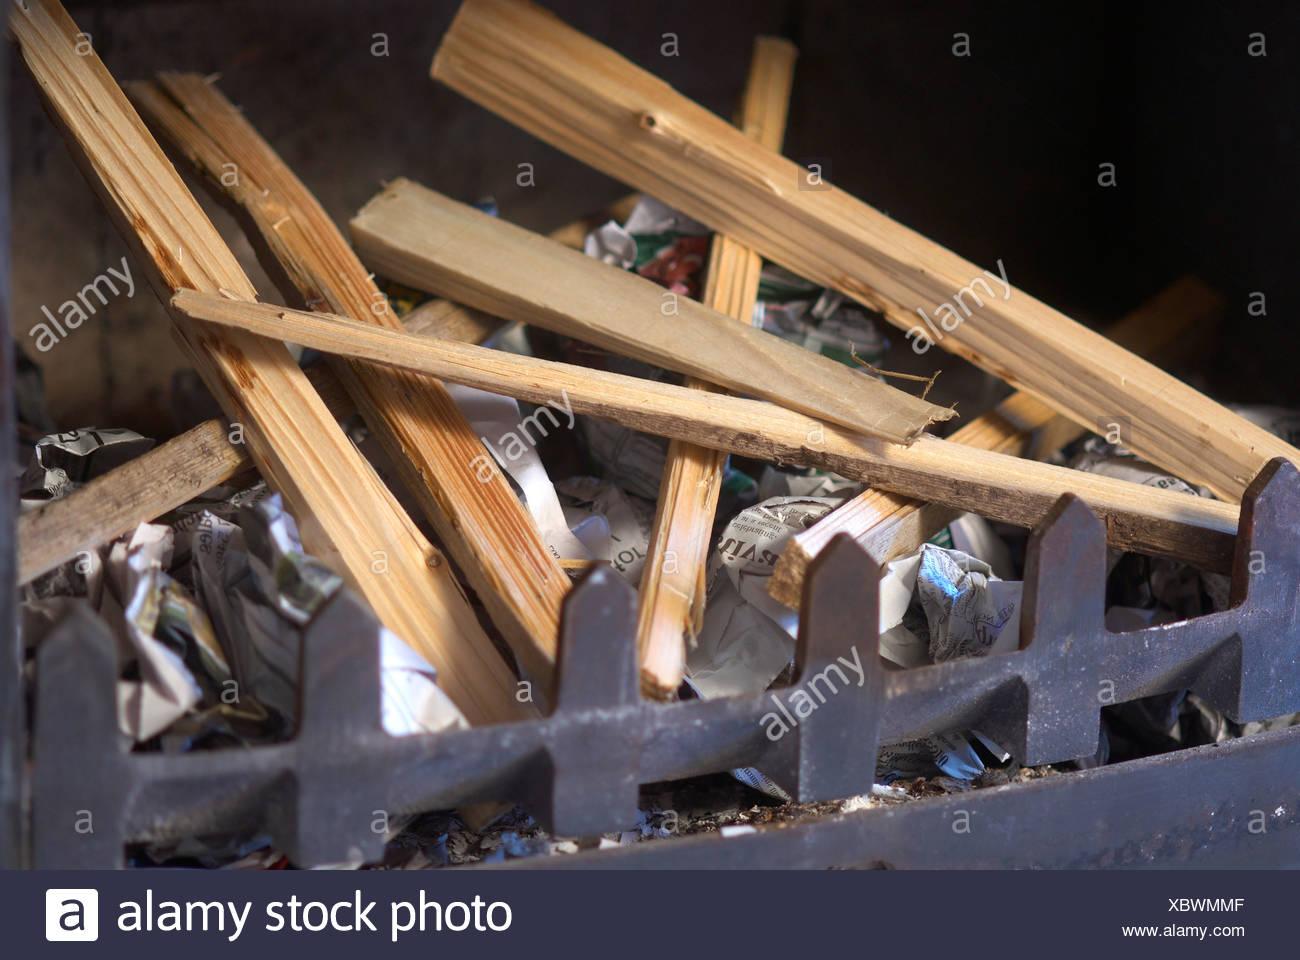 Wood inside a fireplace - Stock Image